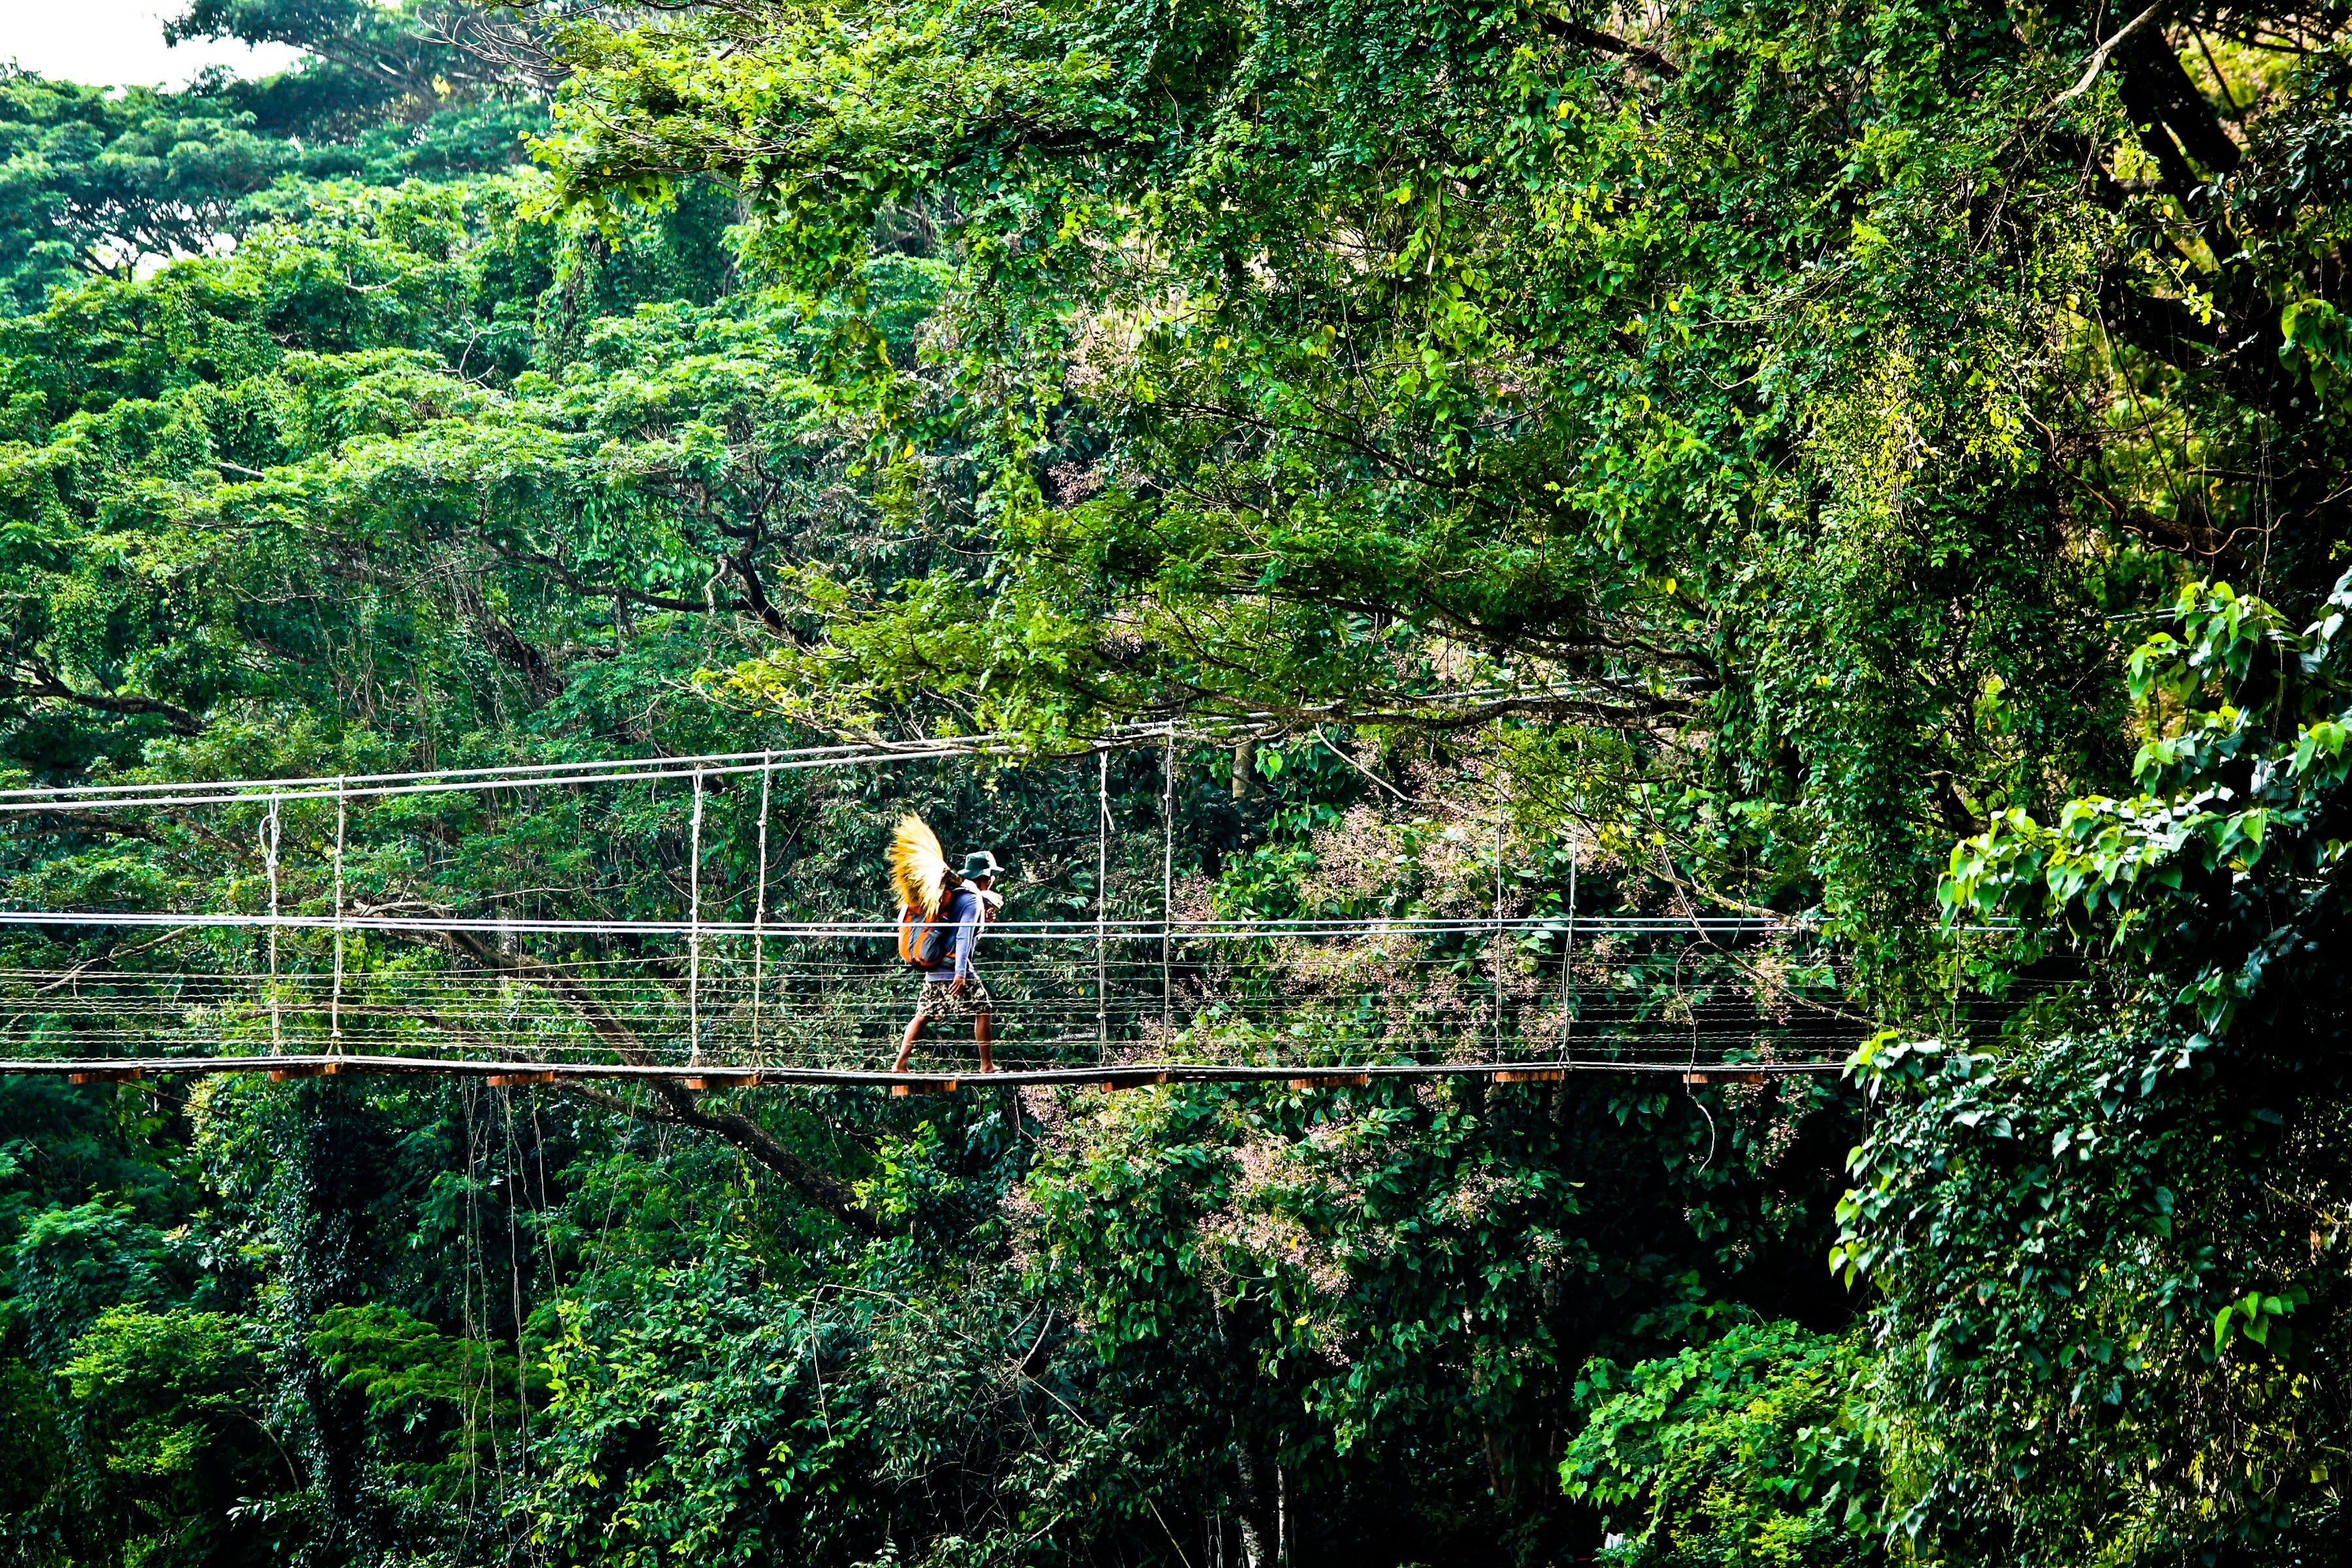 Person Walking on Hanging Bridges Near Trees